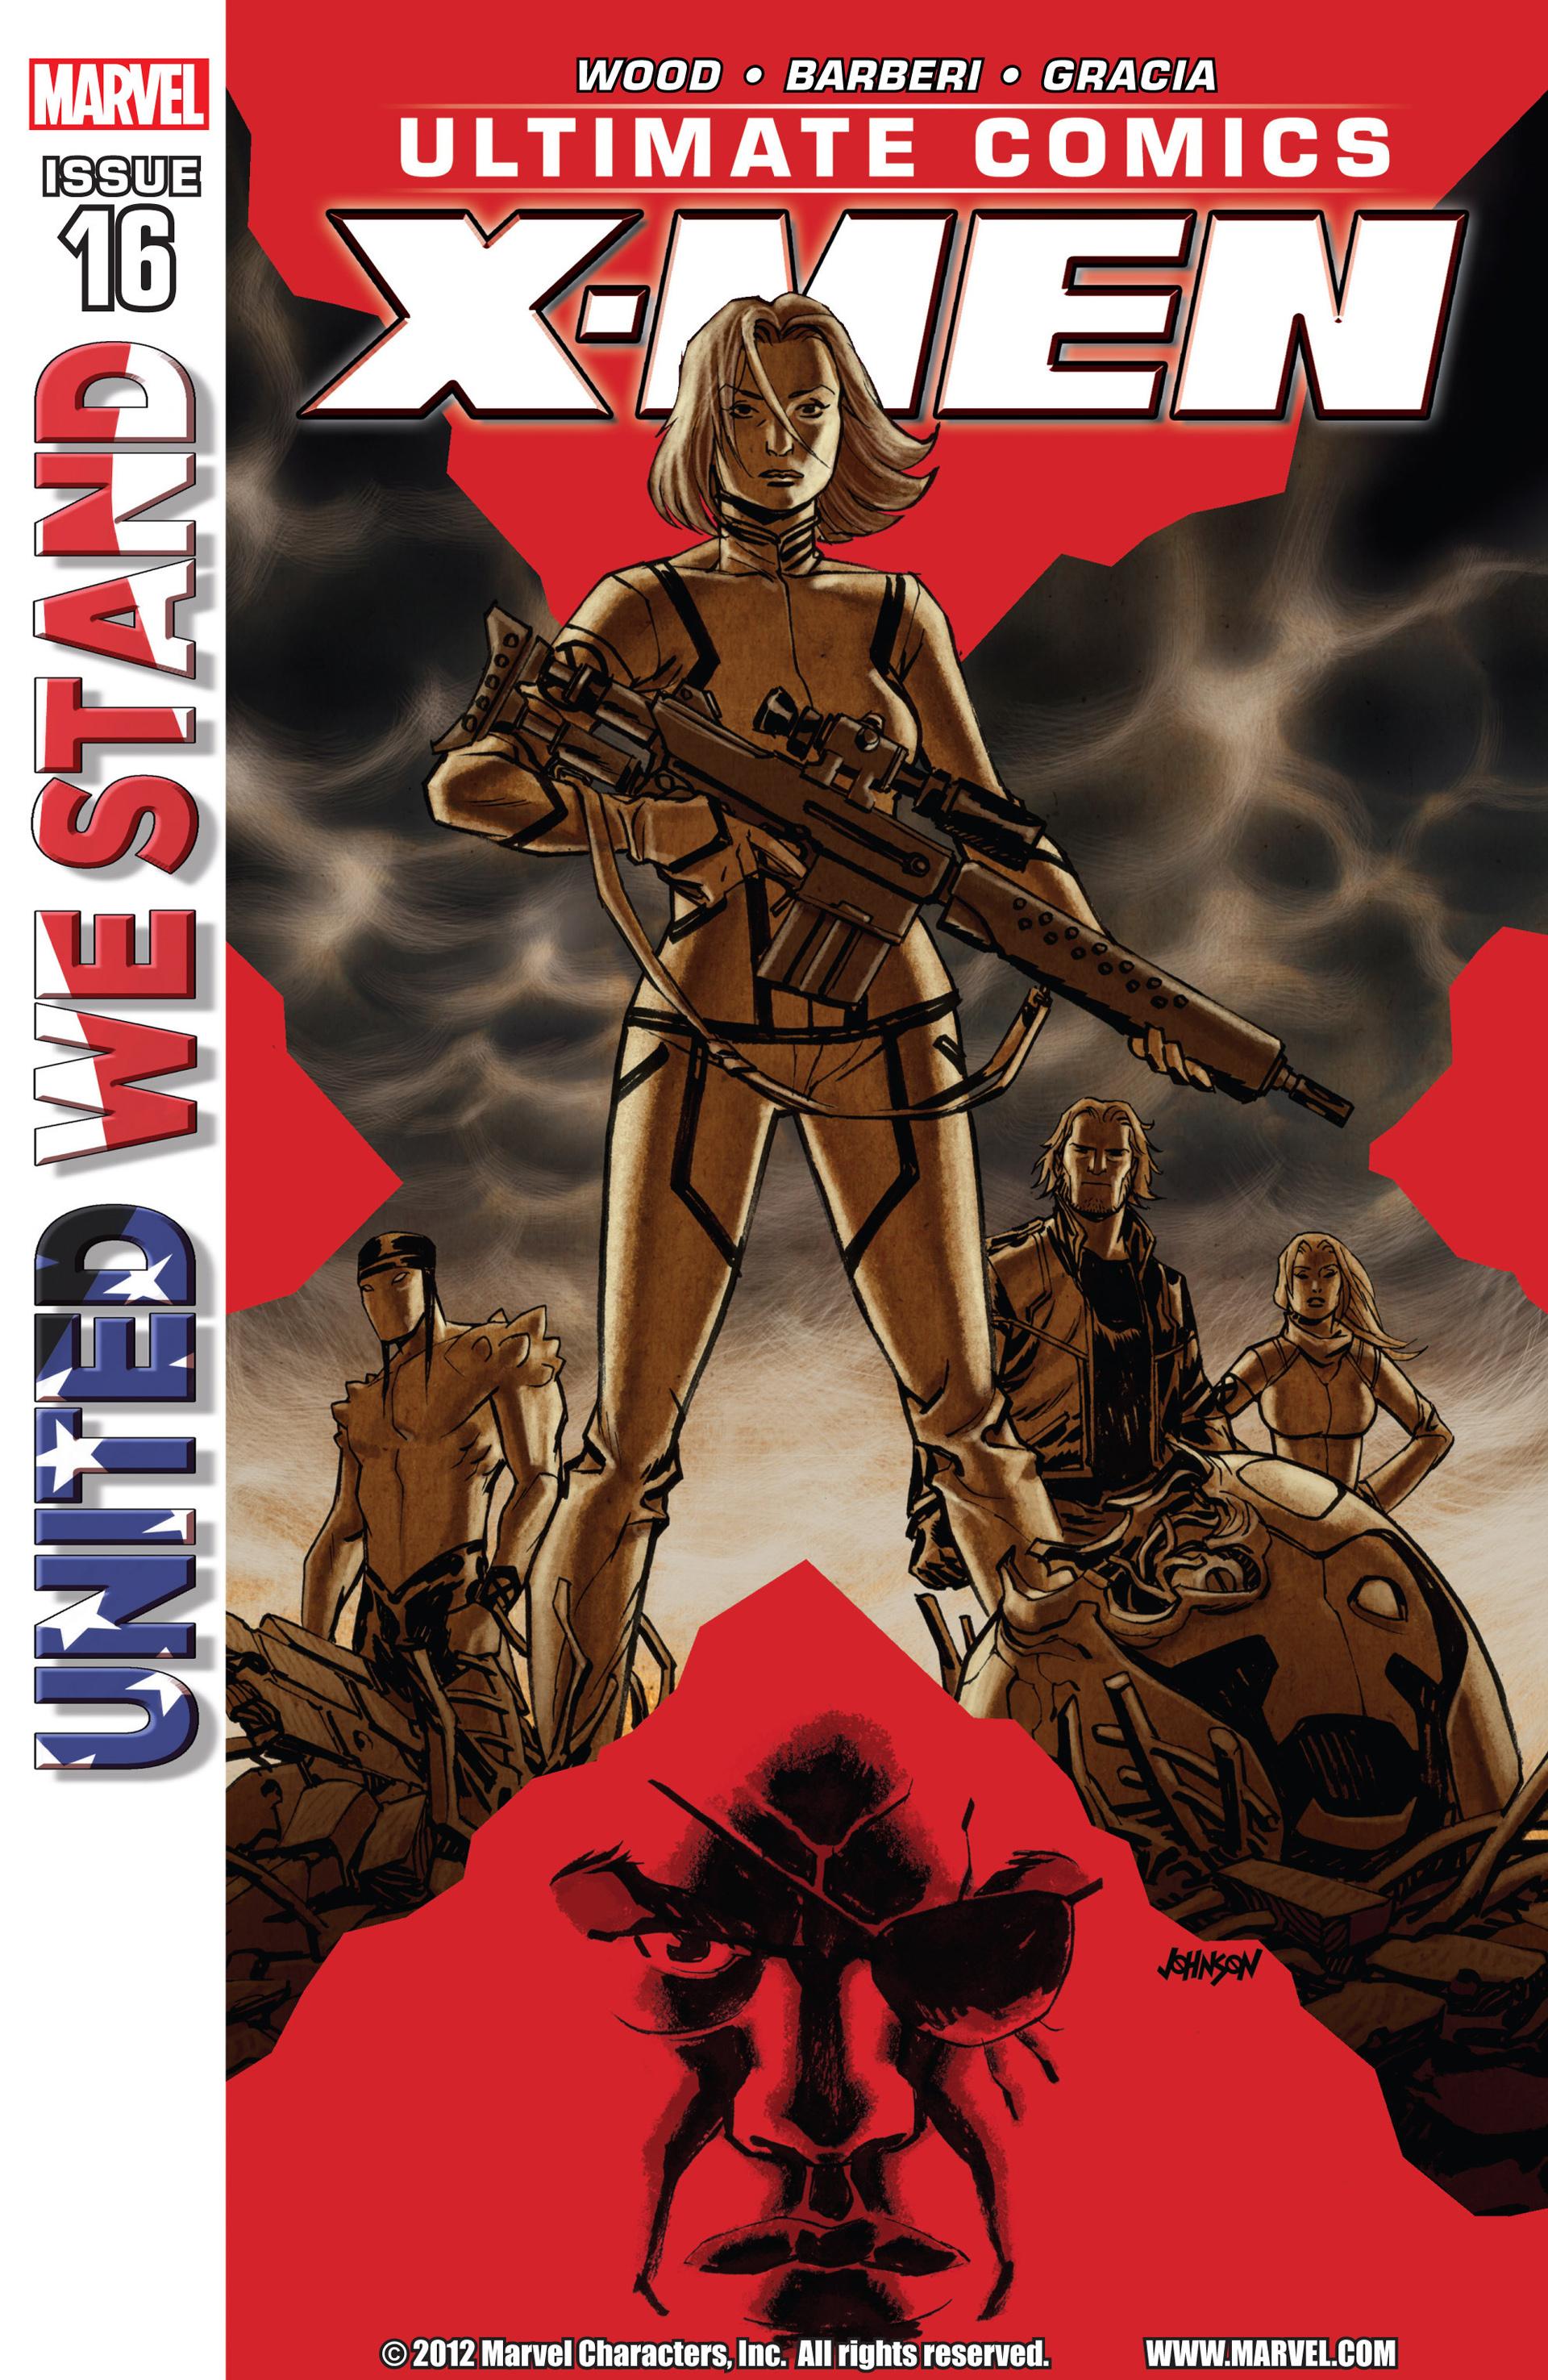 Read online Ultimate Comics X-Men comic -  Issue #16 - 1